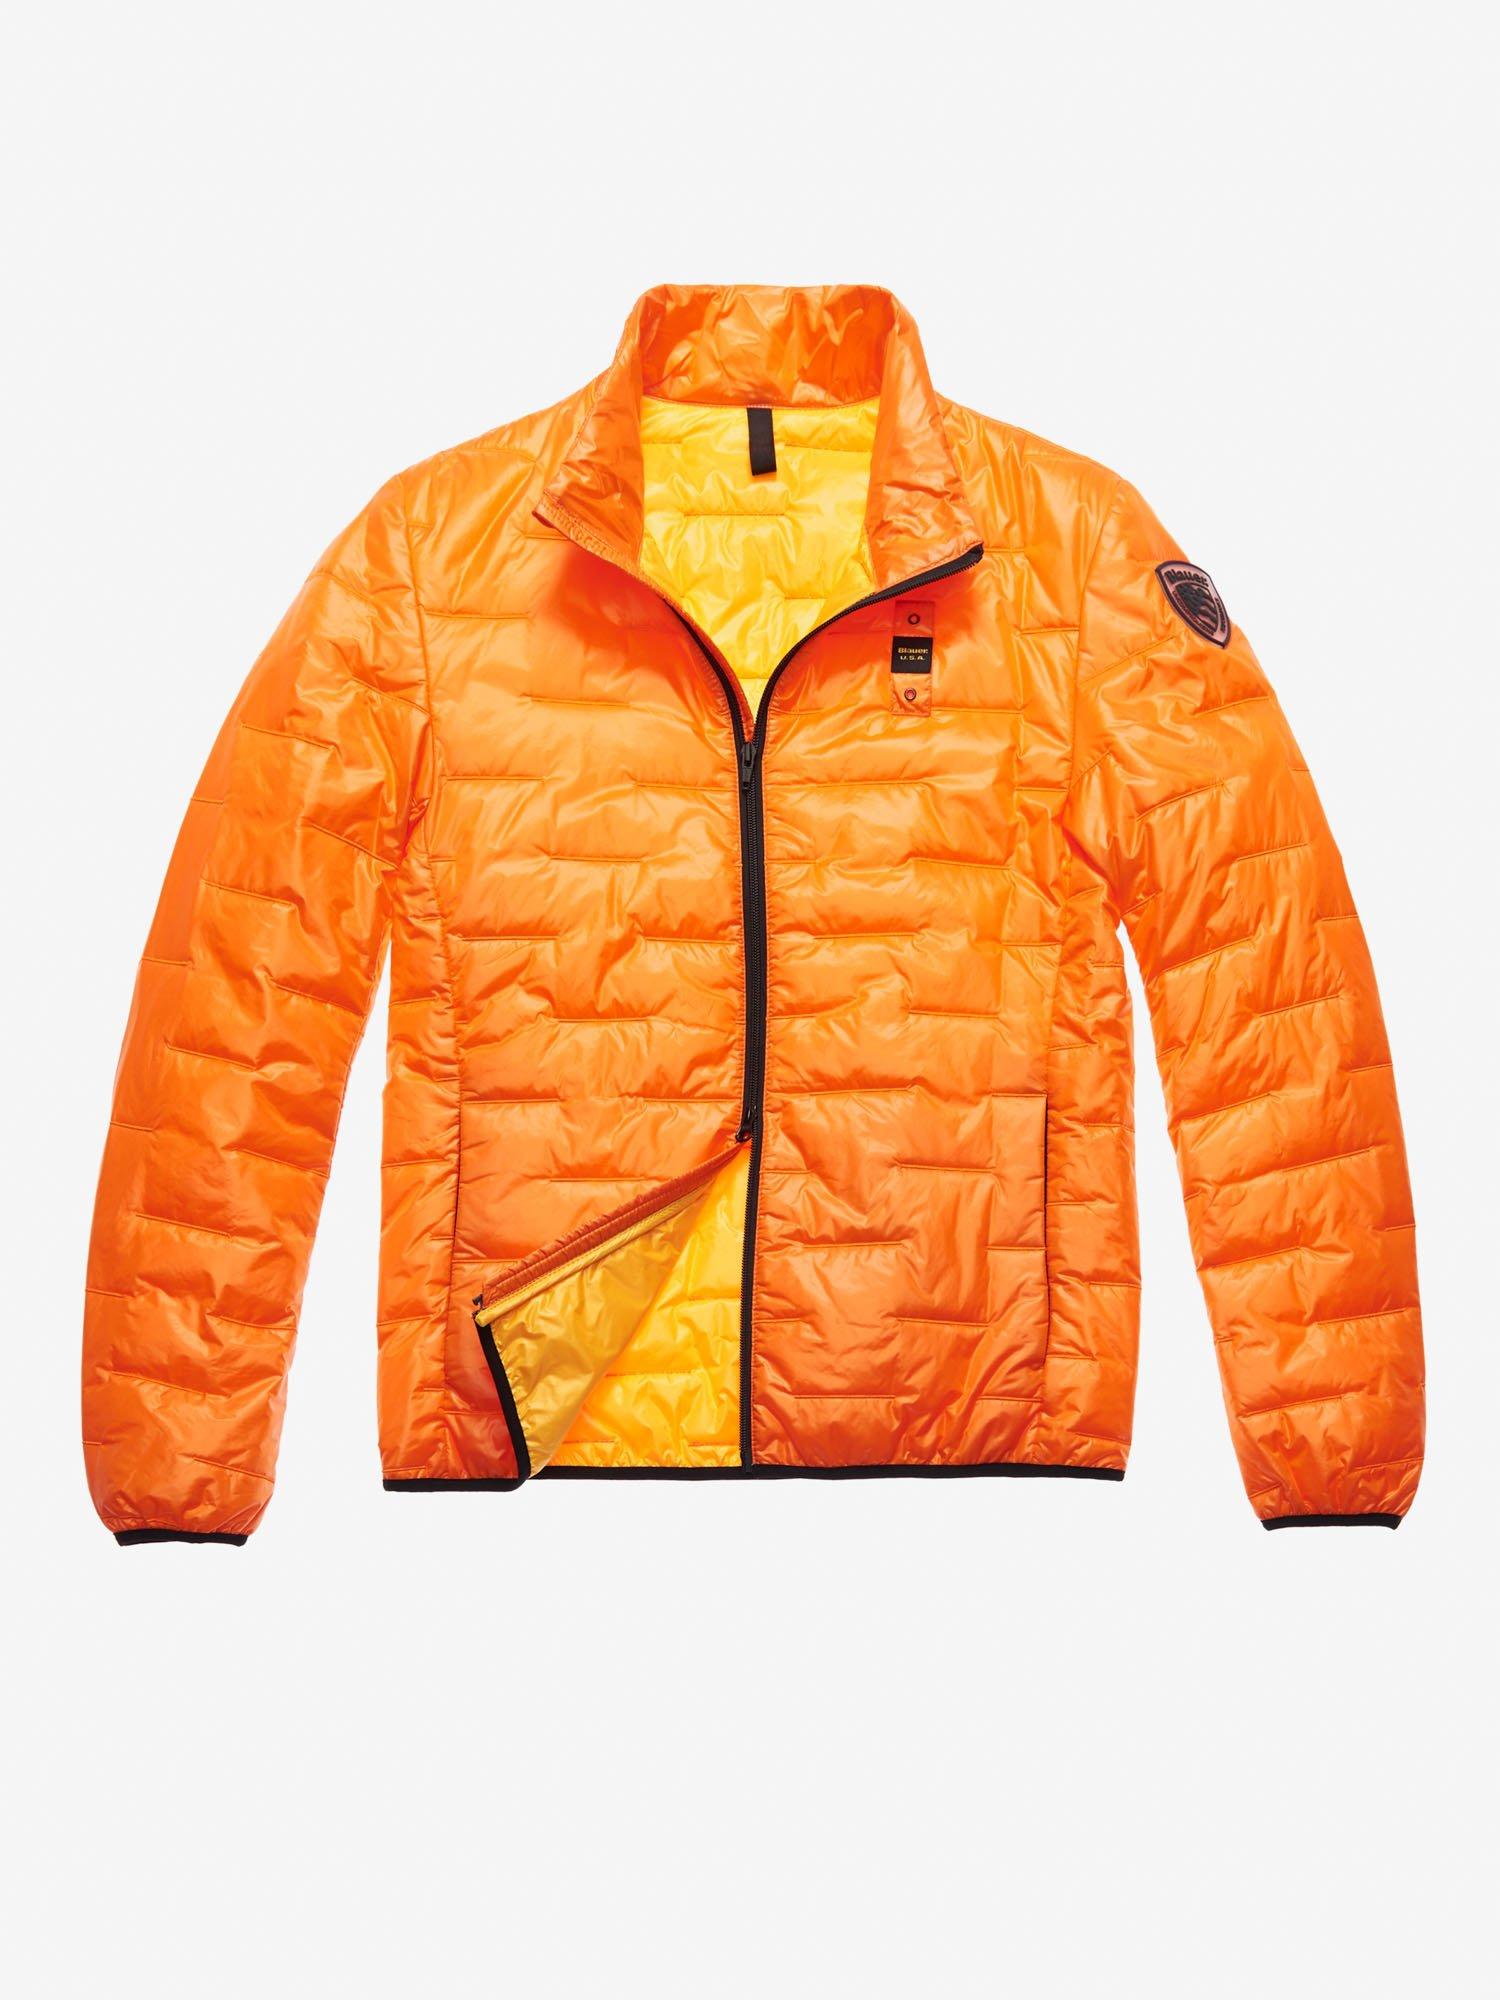 Blauer - HERNANDEZ 100 GR PADDED JACKET - Orange Carrot - Blauer